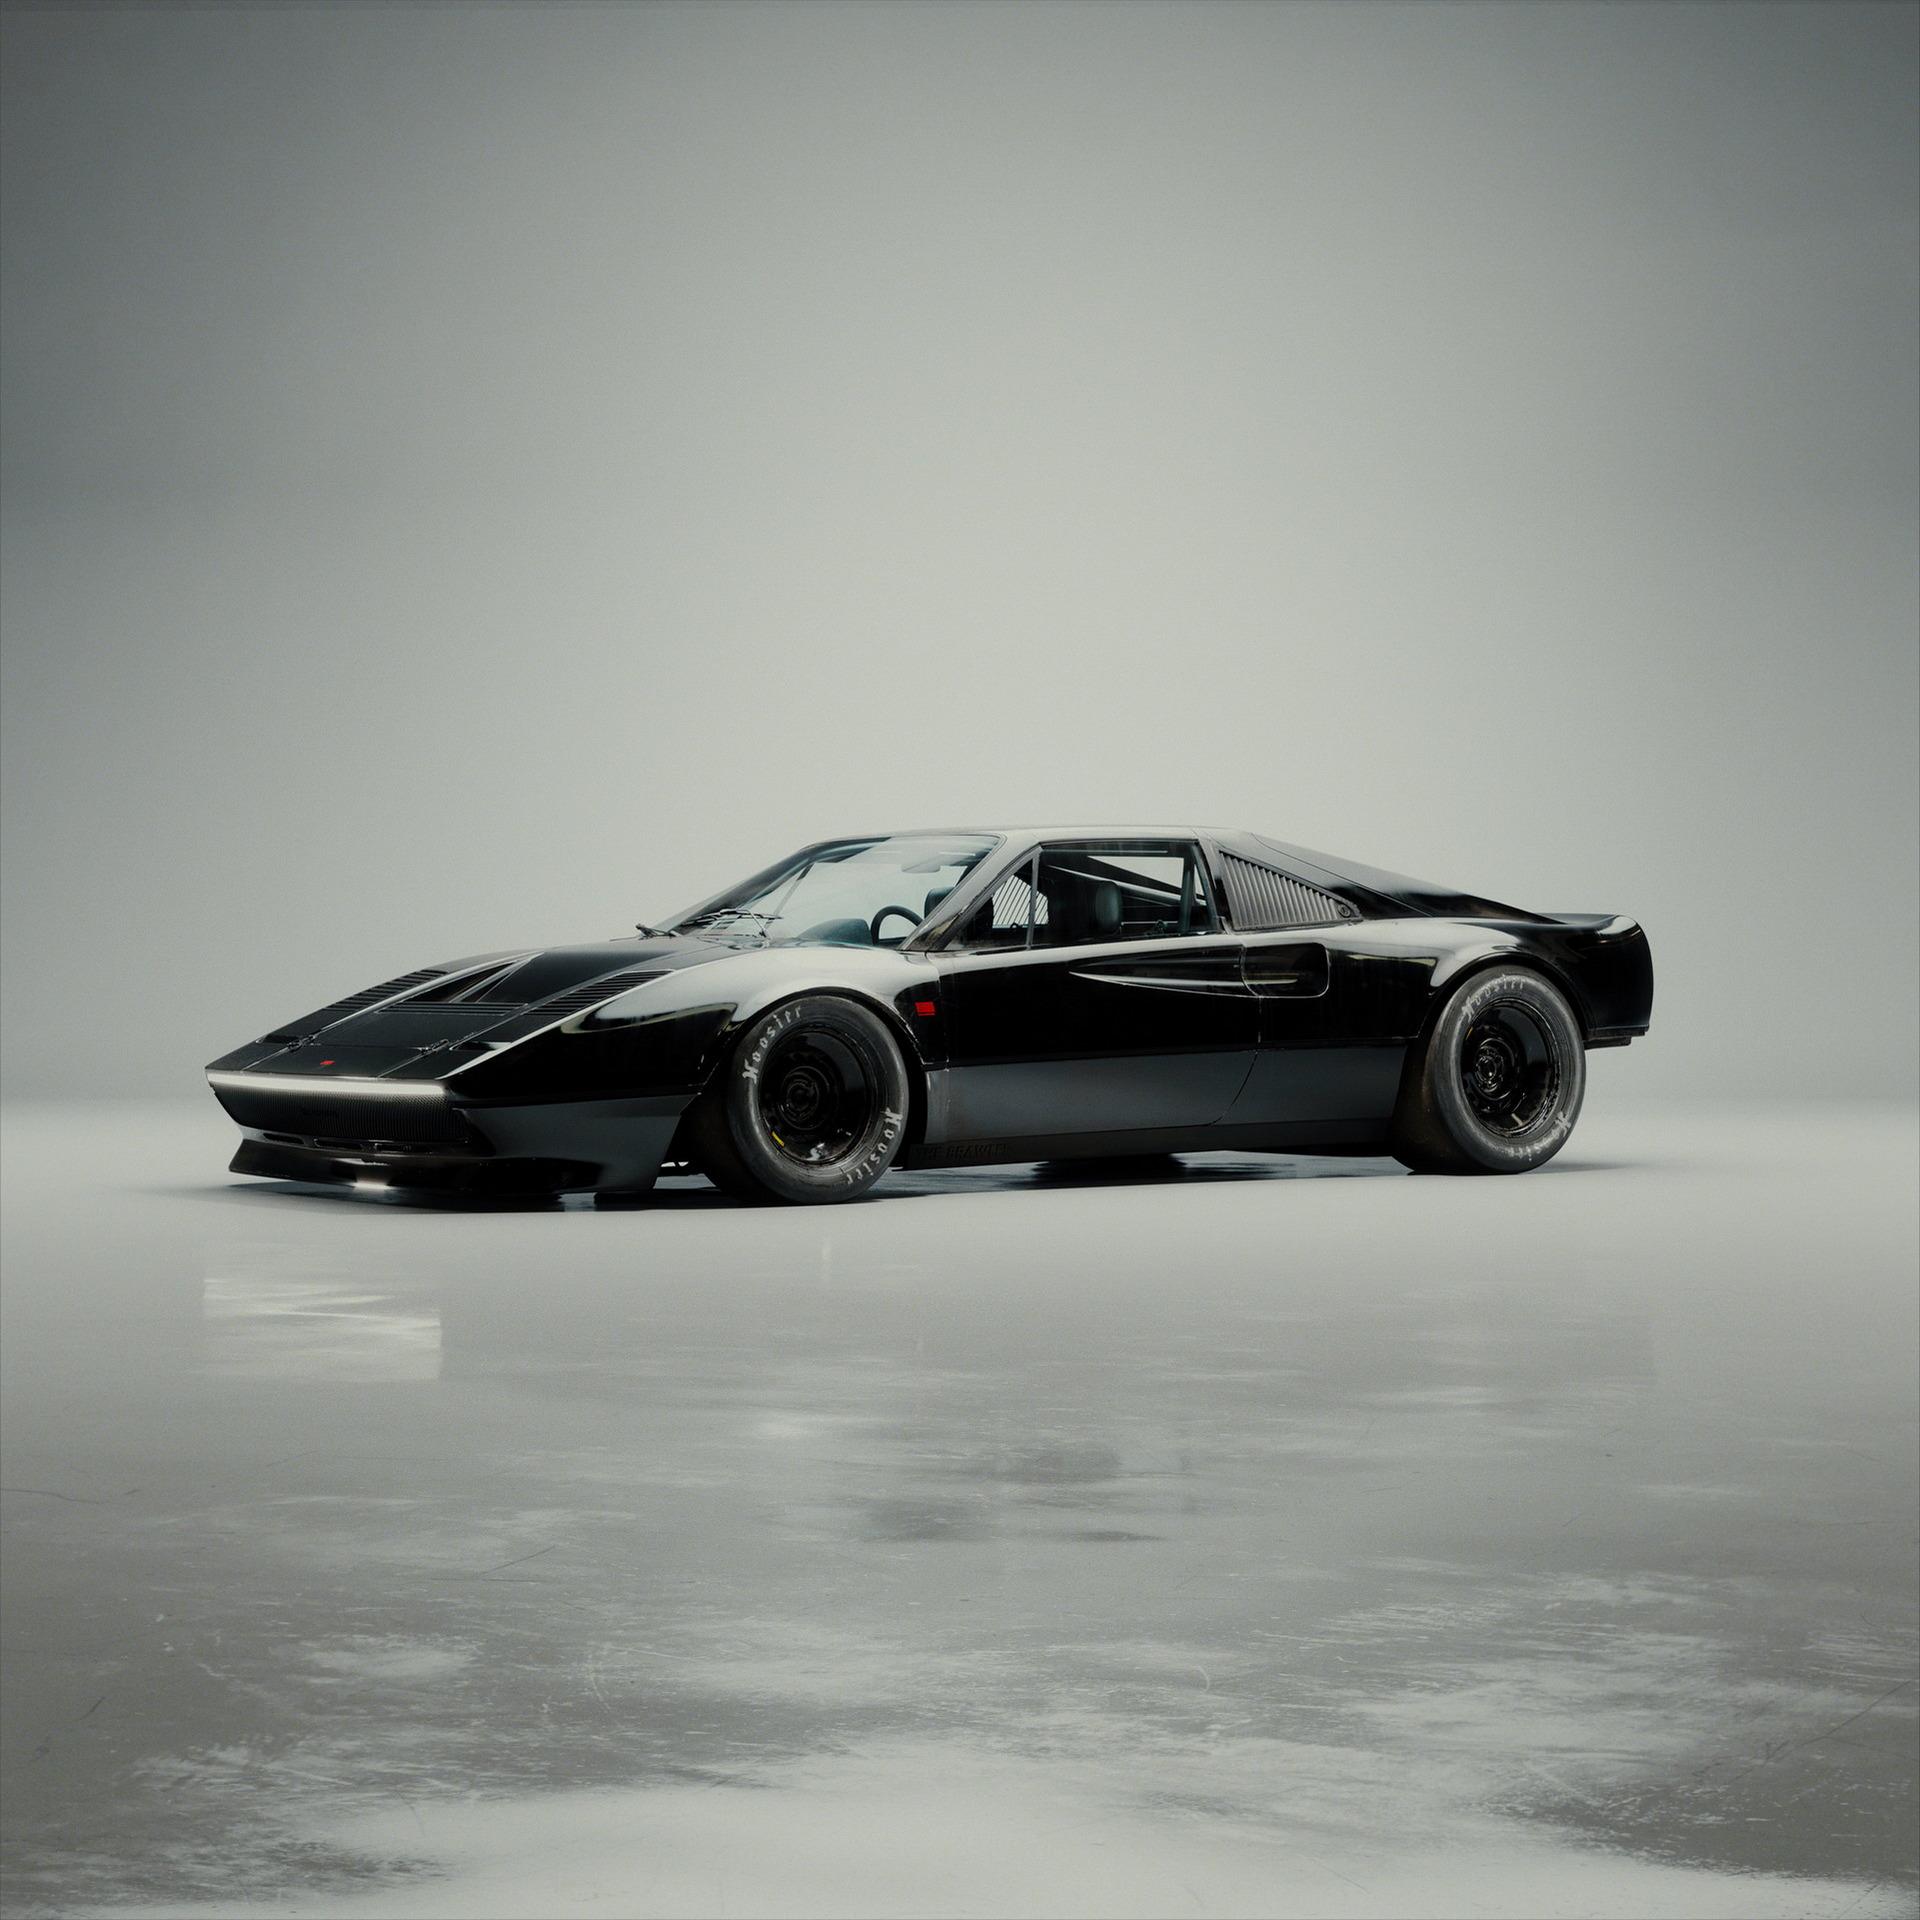 Ferrari 308 Brawler